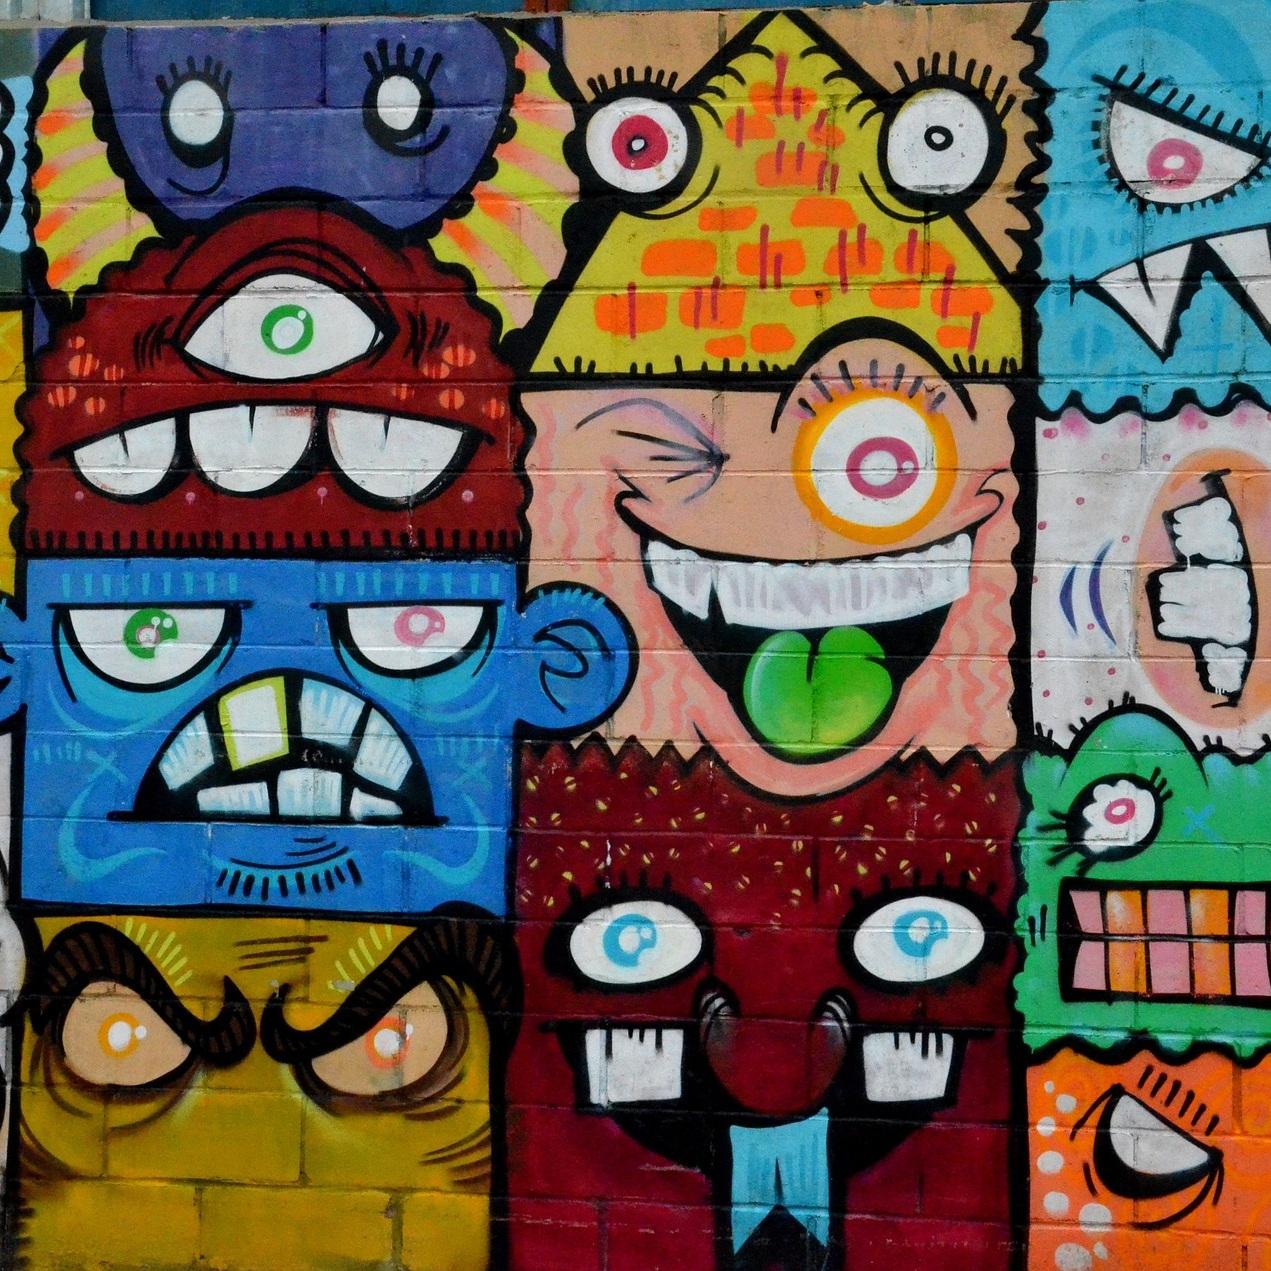 street-art-977790_1920.jpg